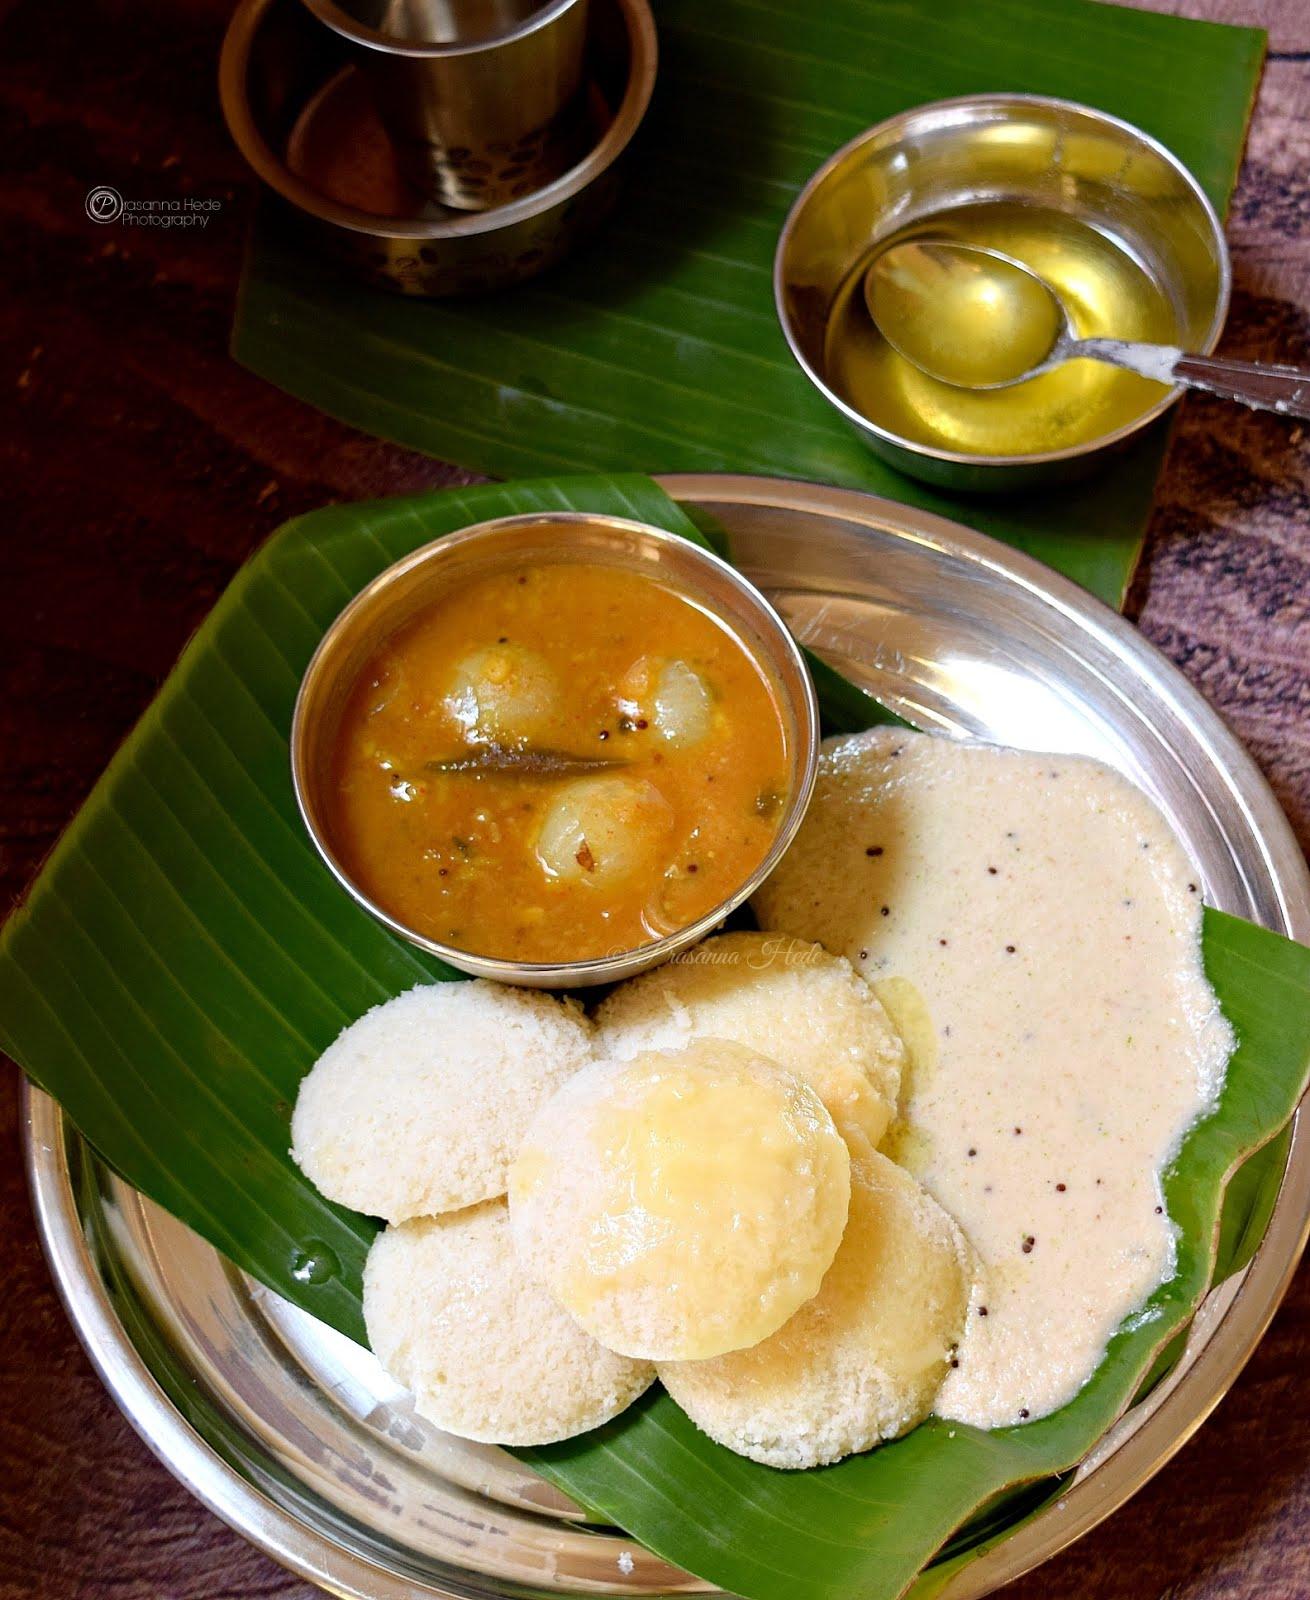 Tiffin Sambar Restaurant Style Idli Sambar Instant Pot Pressure cooker recipe